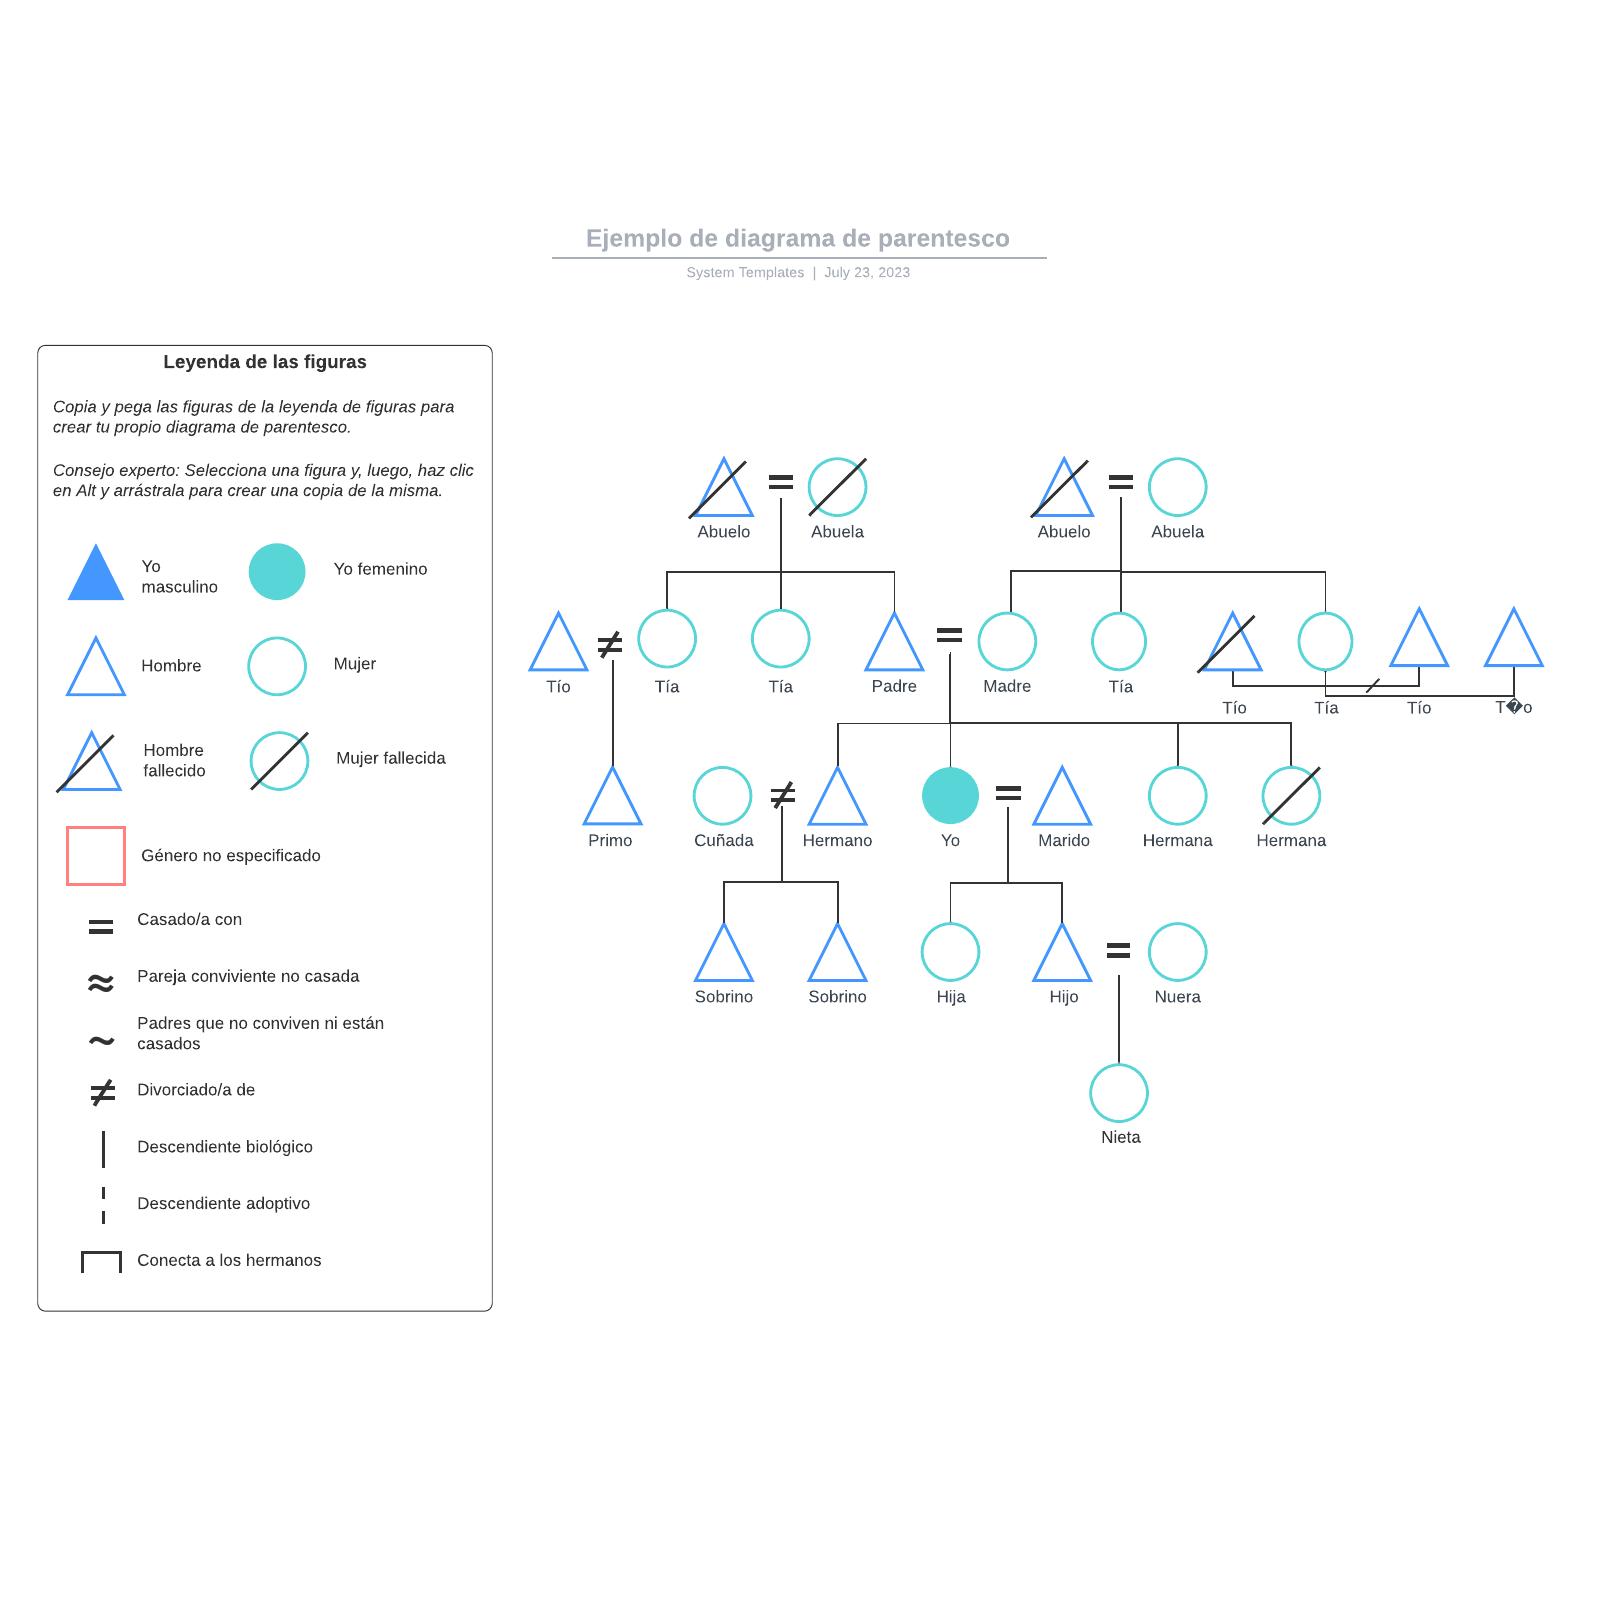 Ejemplo de diagrama de parentesco